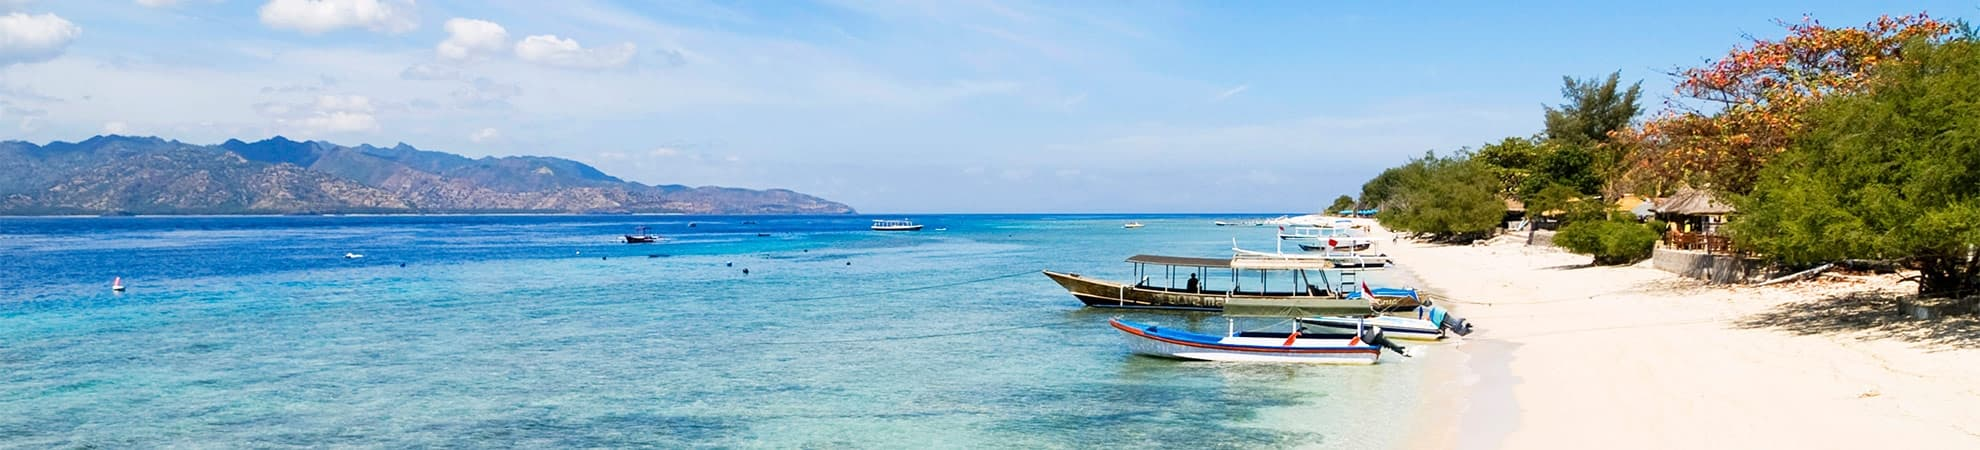 Voyage Bali et Îles